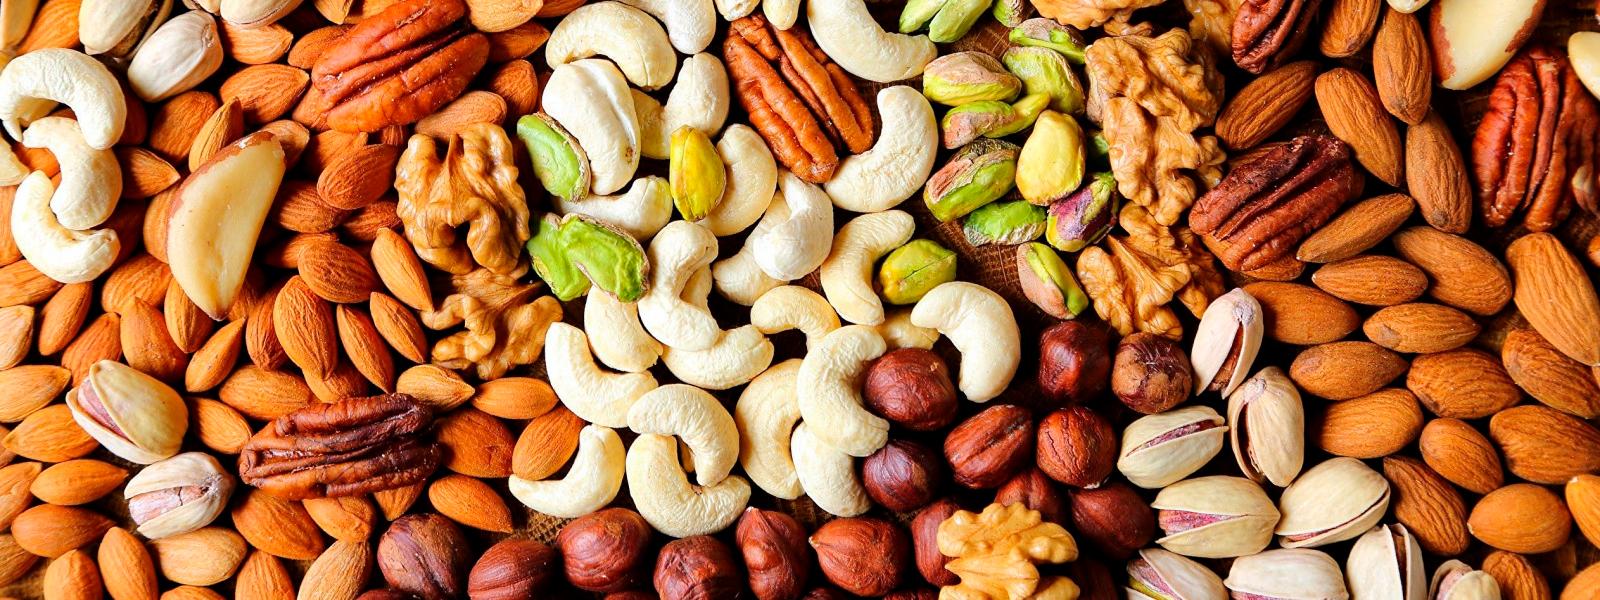 banner-carino-ingredientes-nuts-amendoim-castanha-amendoas-avela